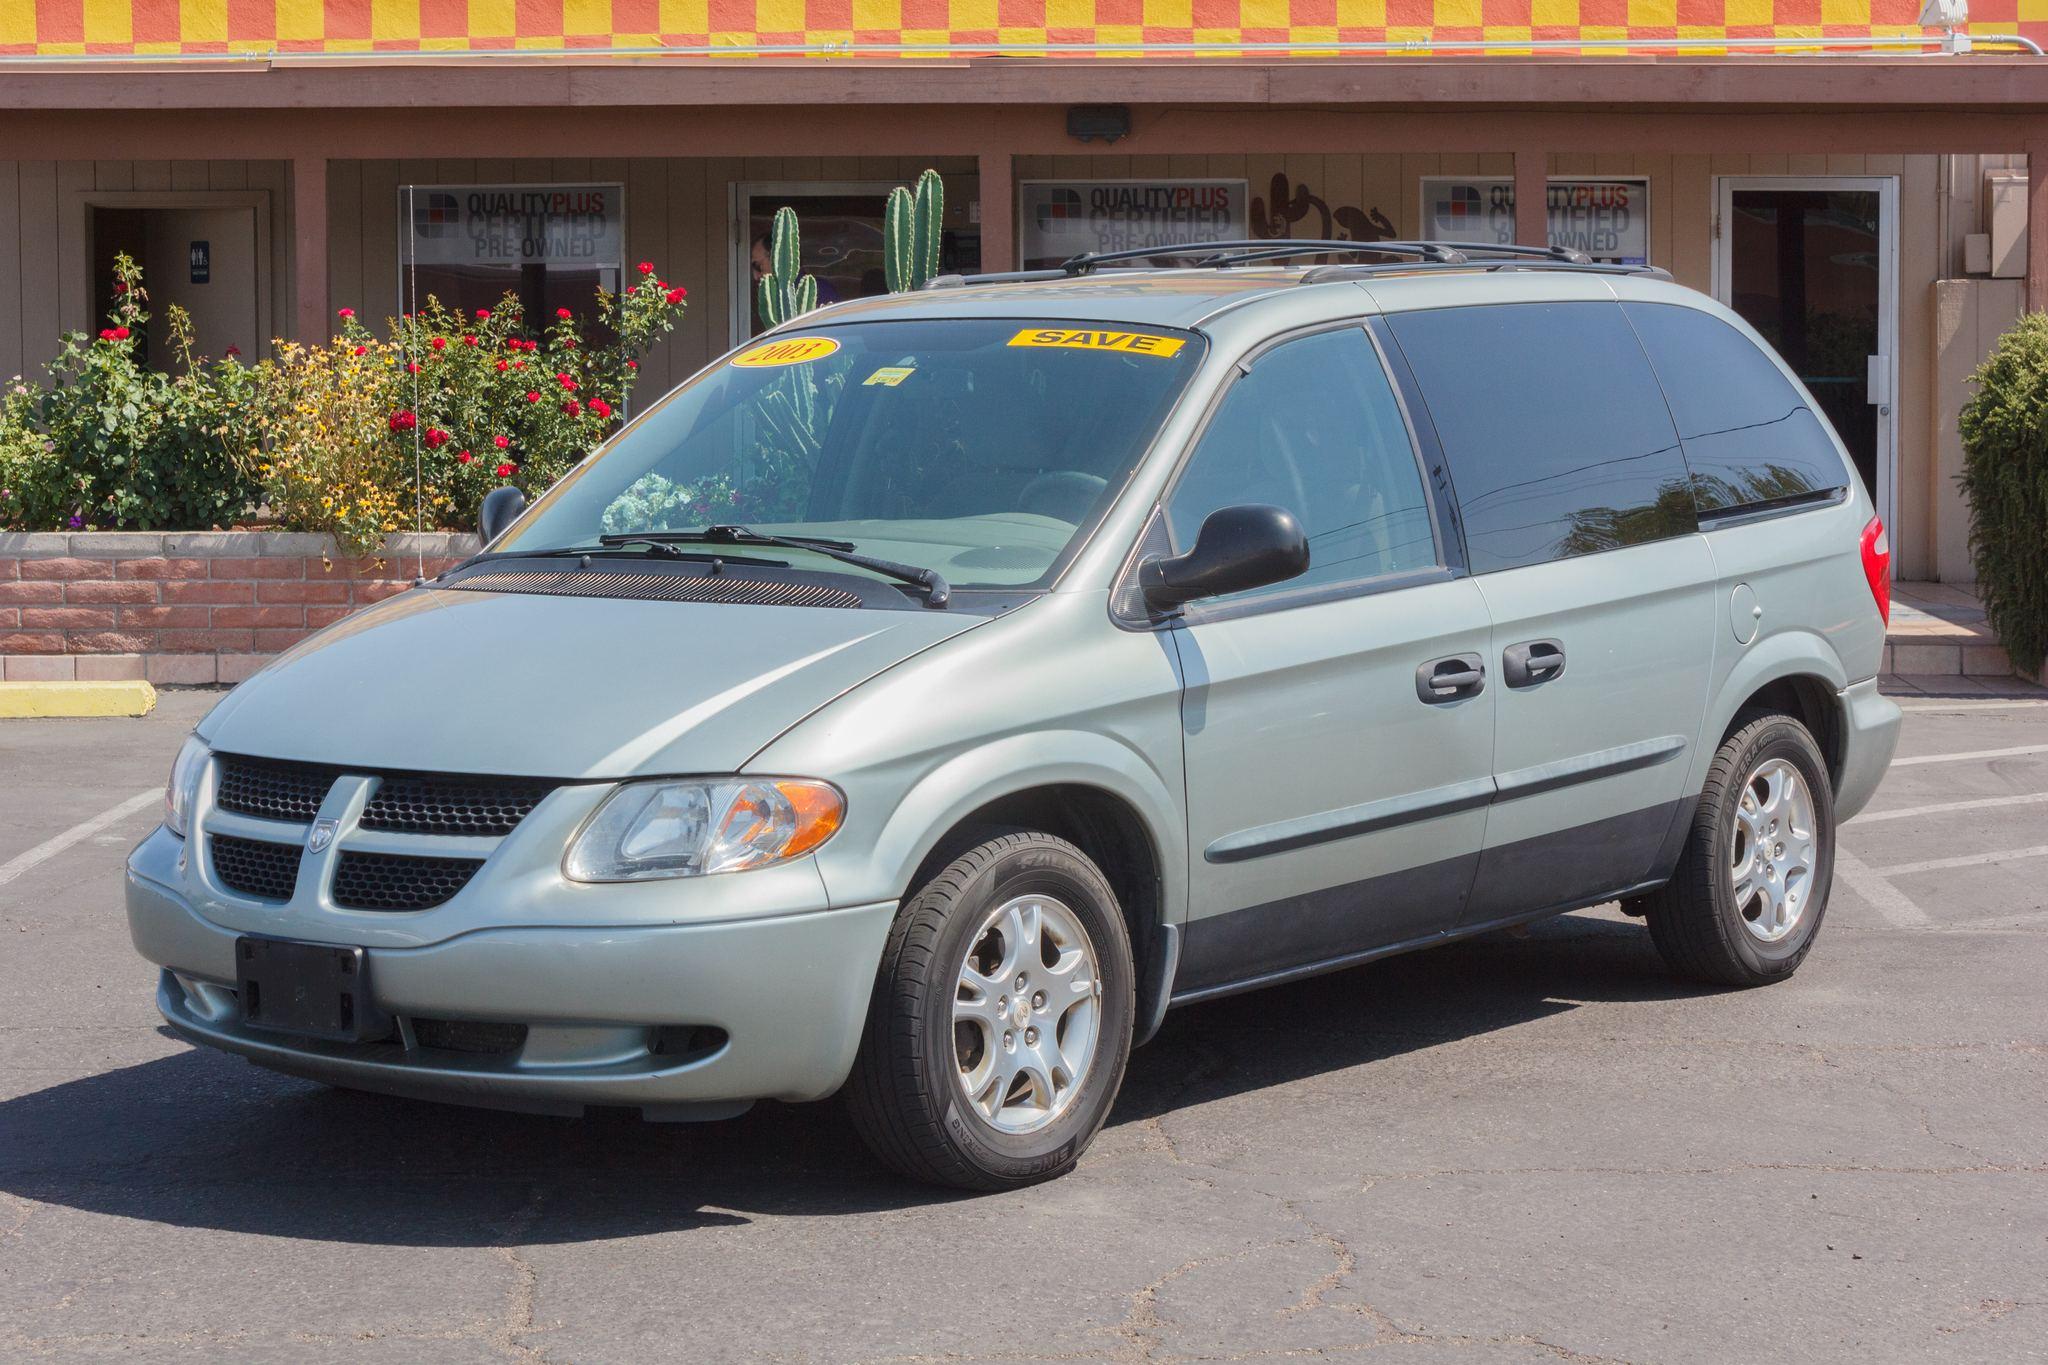 Photo of 2003 Dodge Caravan 4d Wagon SXT Patriot Blue Pearlcoat